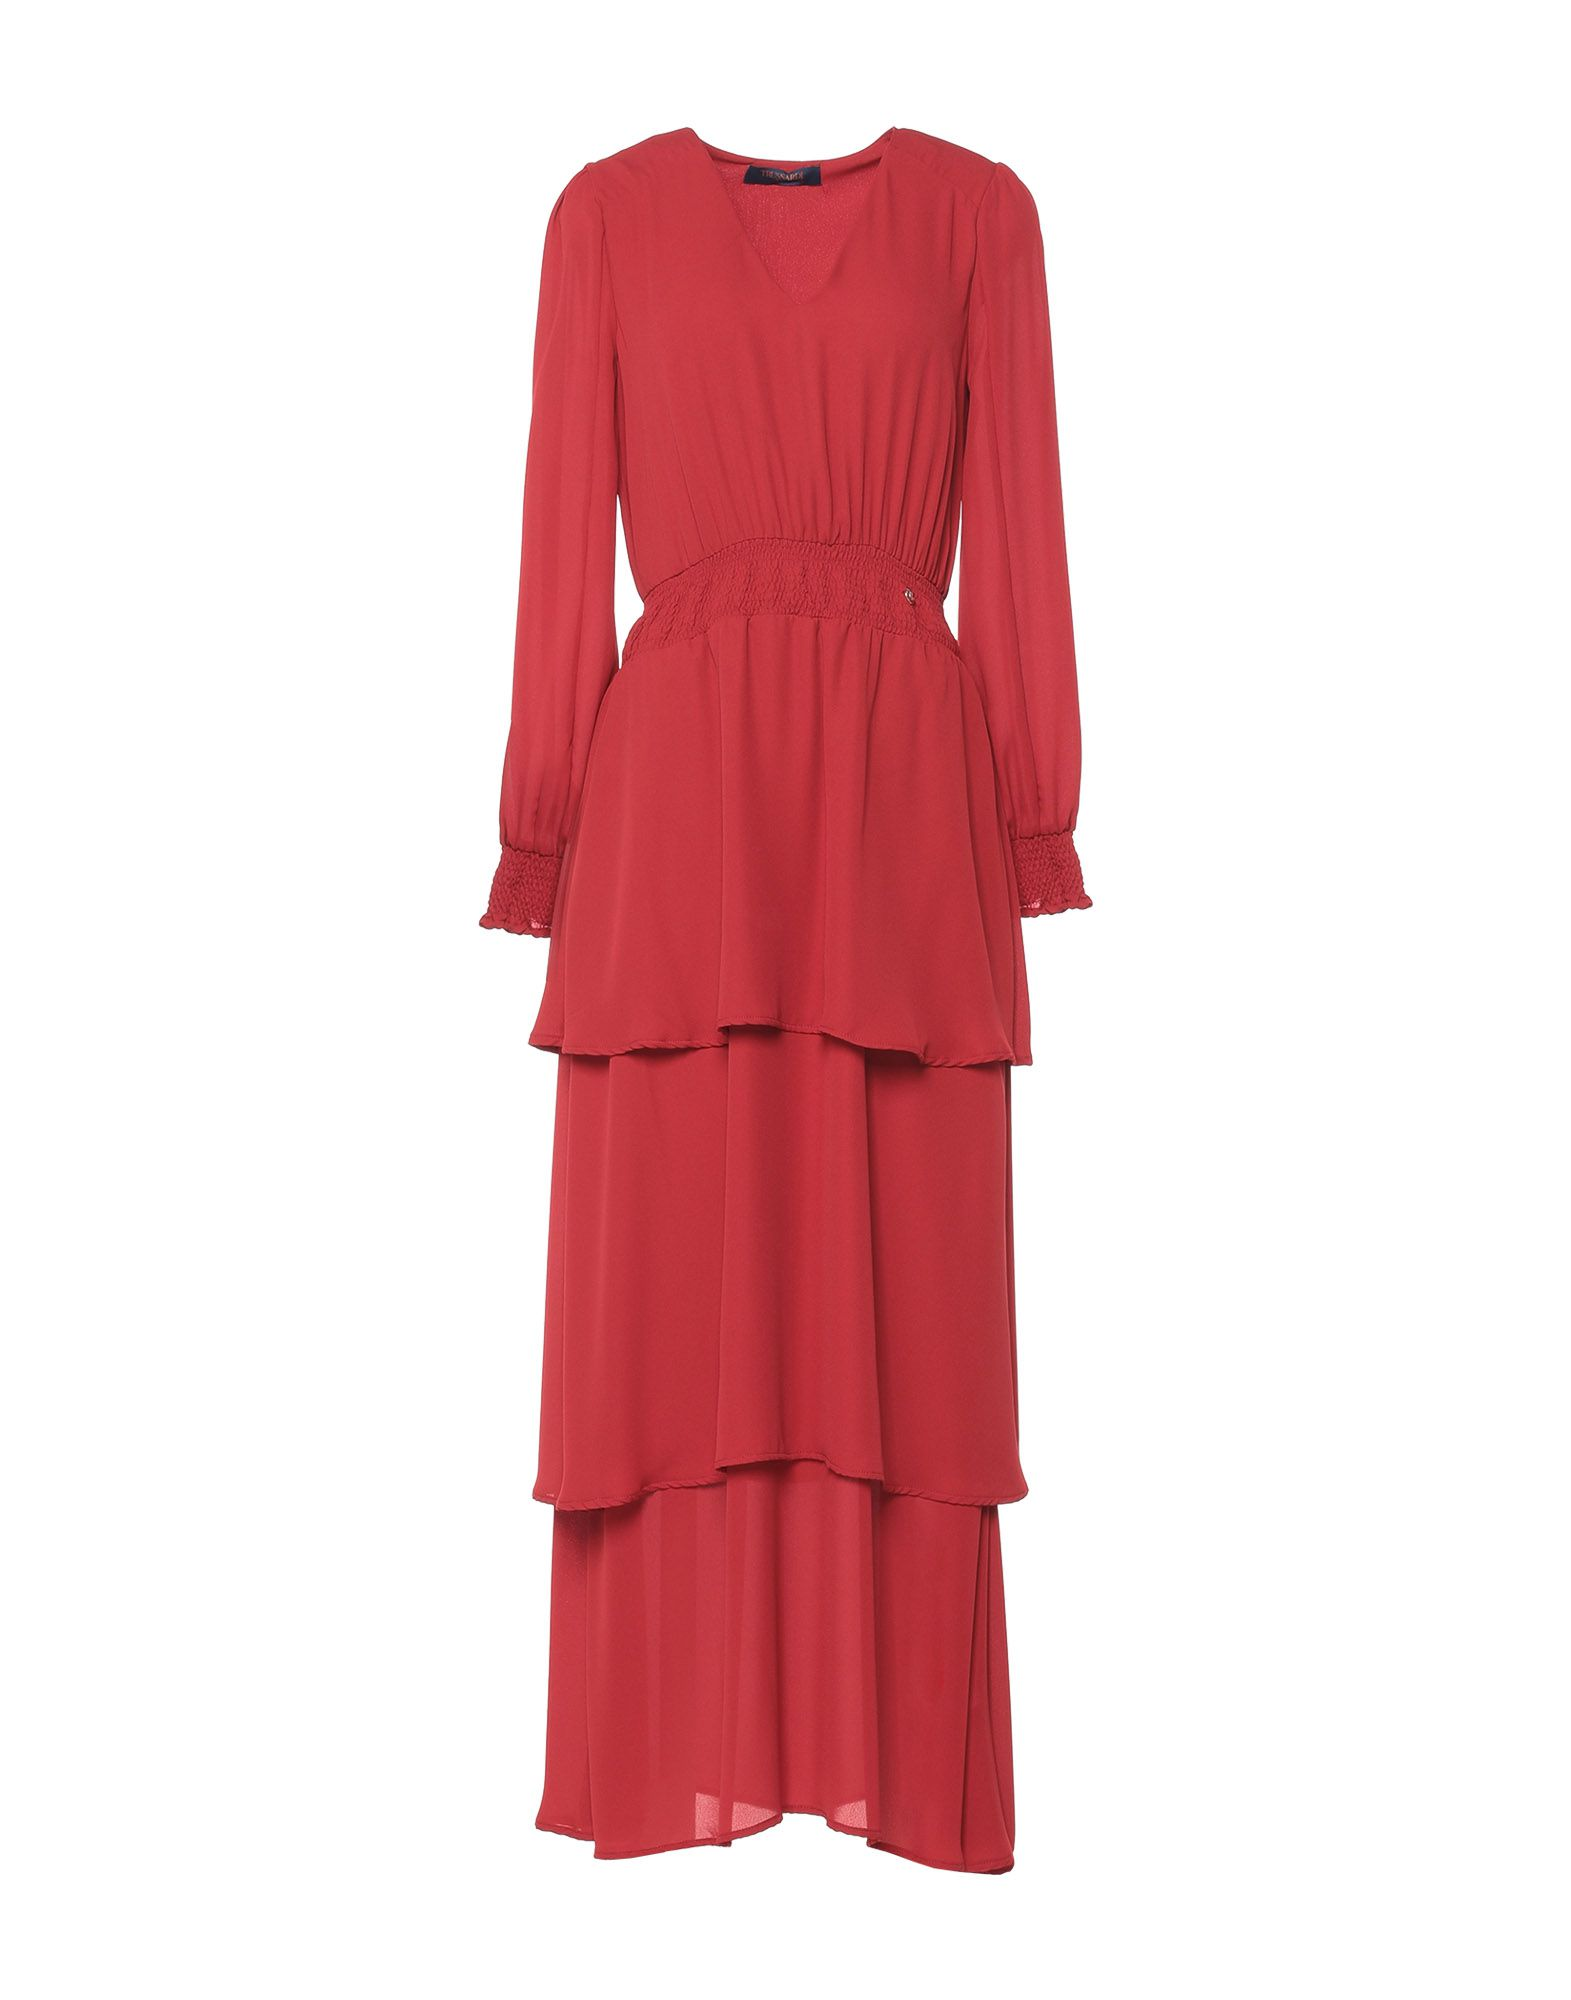 Фото - TRUSSARDI JEANS Длинное платье платье trussardi jeans платье